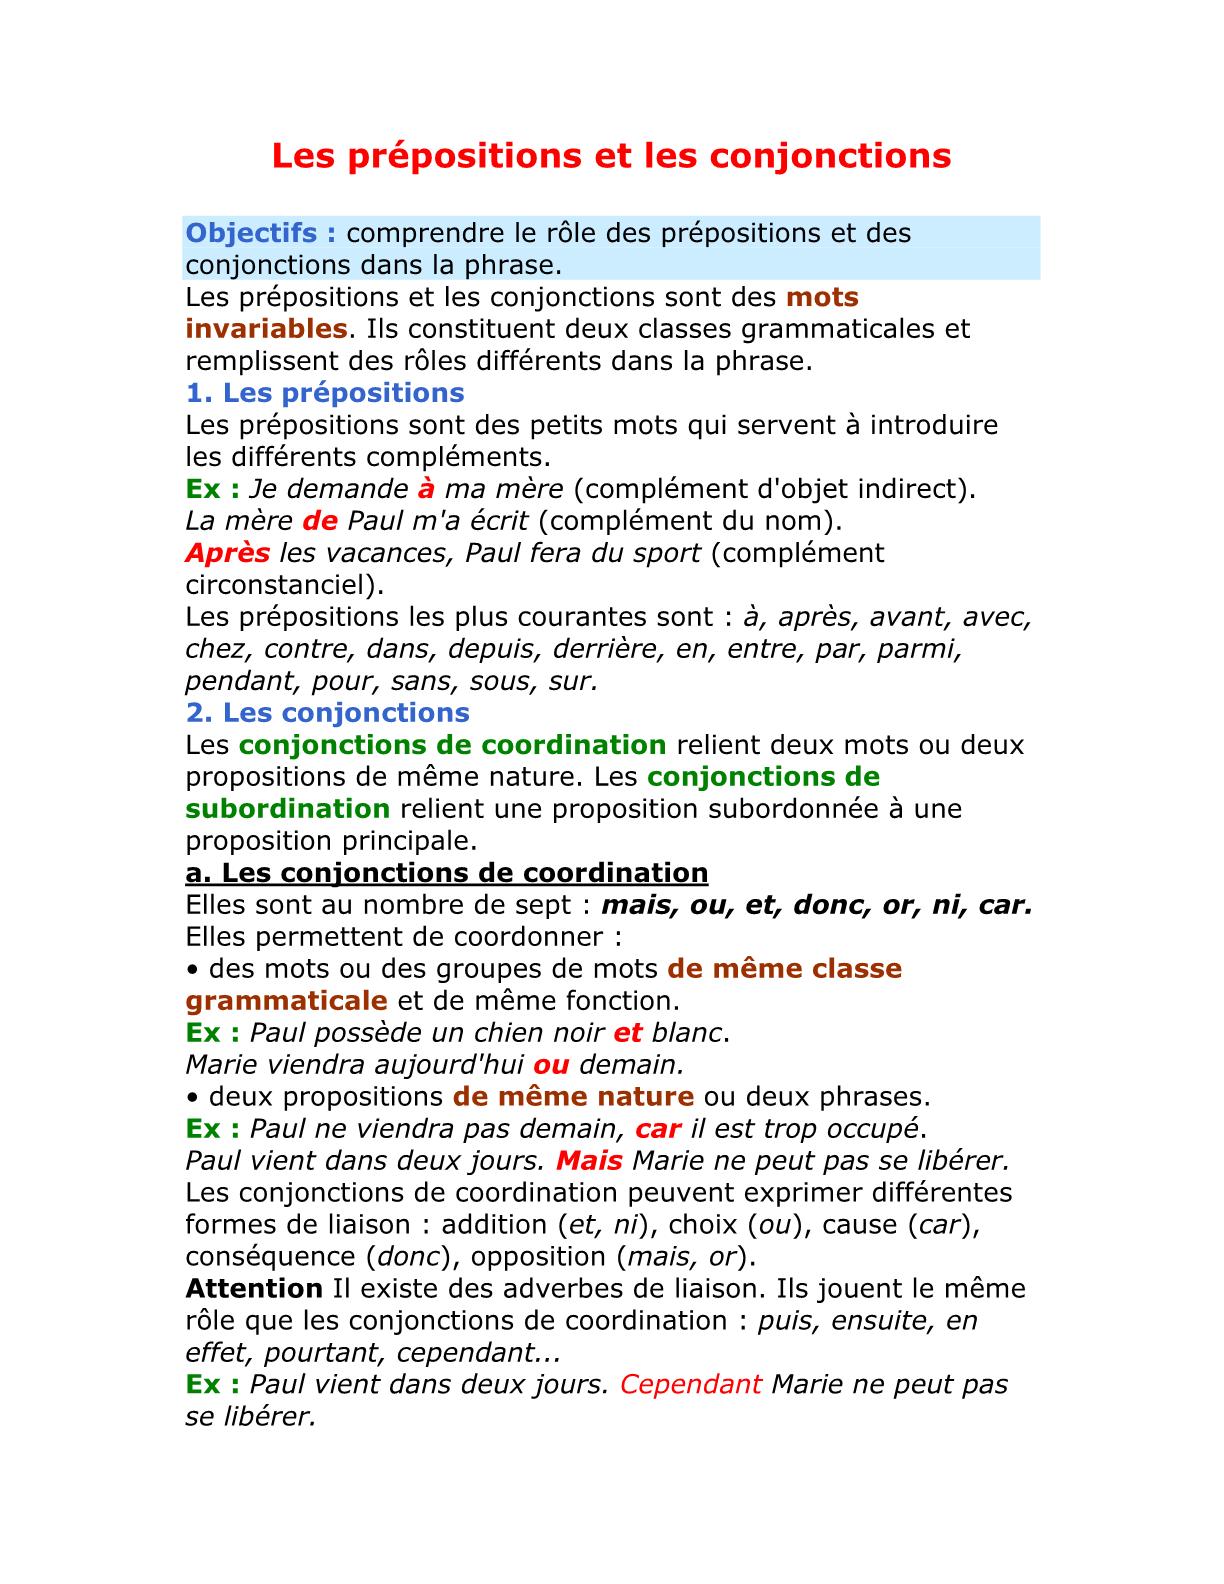 درس Les prépositions et les conjonctions للسنة الأولى إعدادي